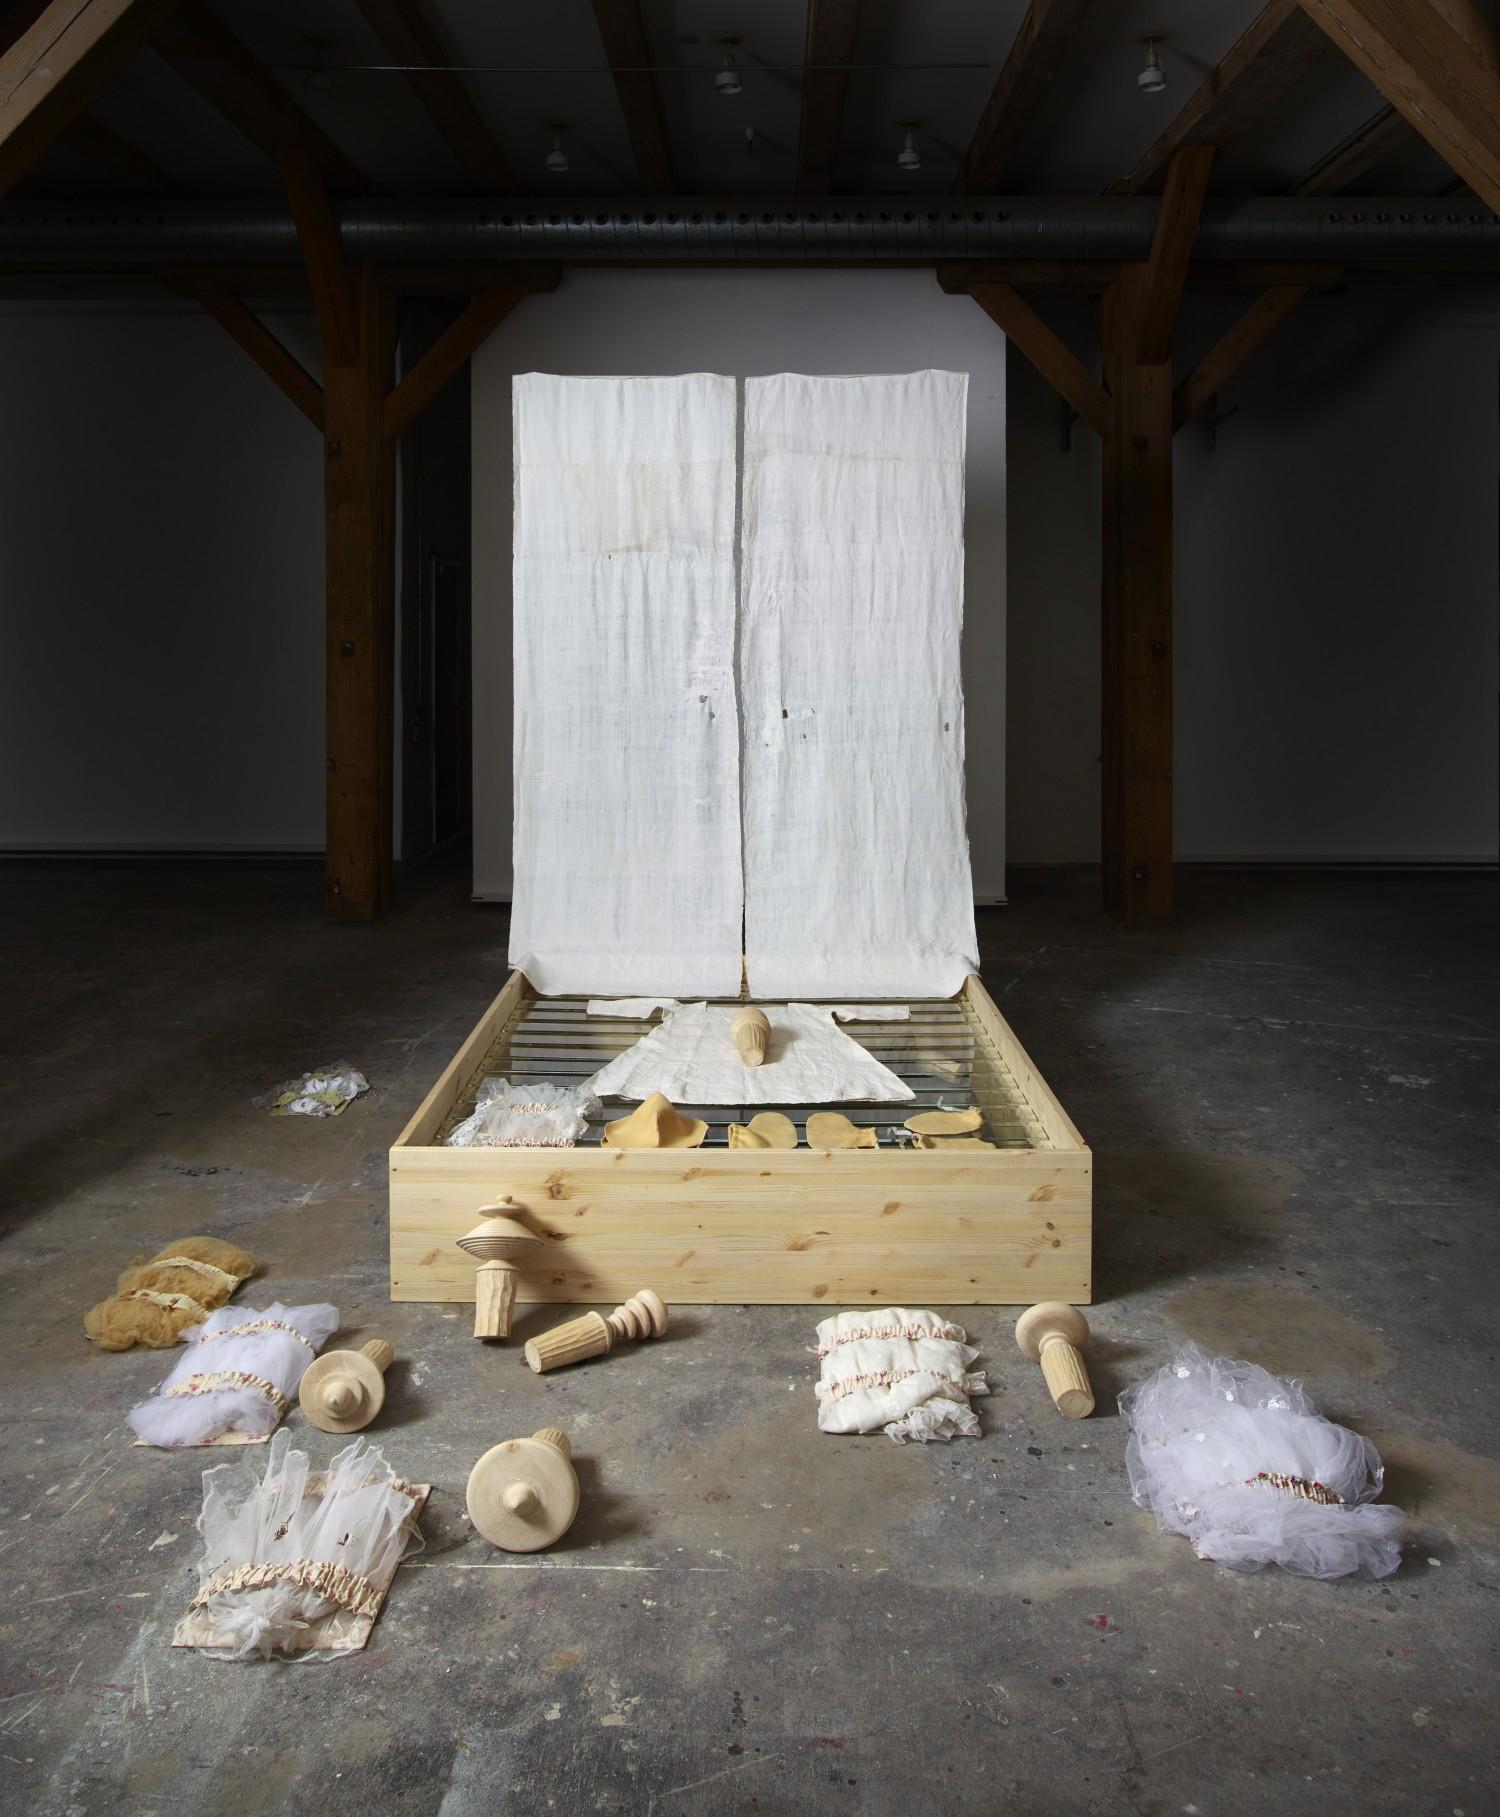 Bridal Chest, The Museum of Art, Vejle, Denmark